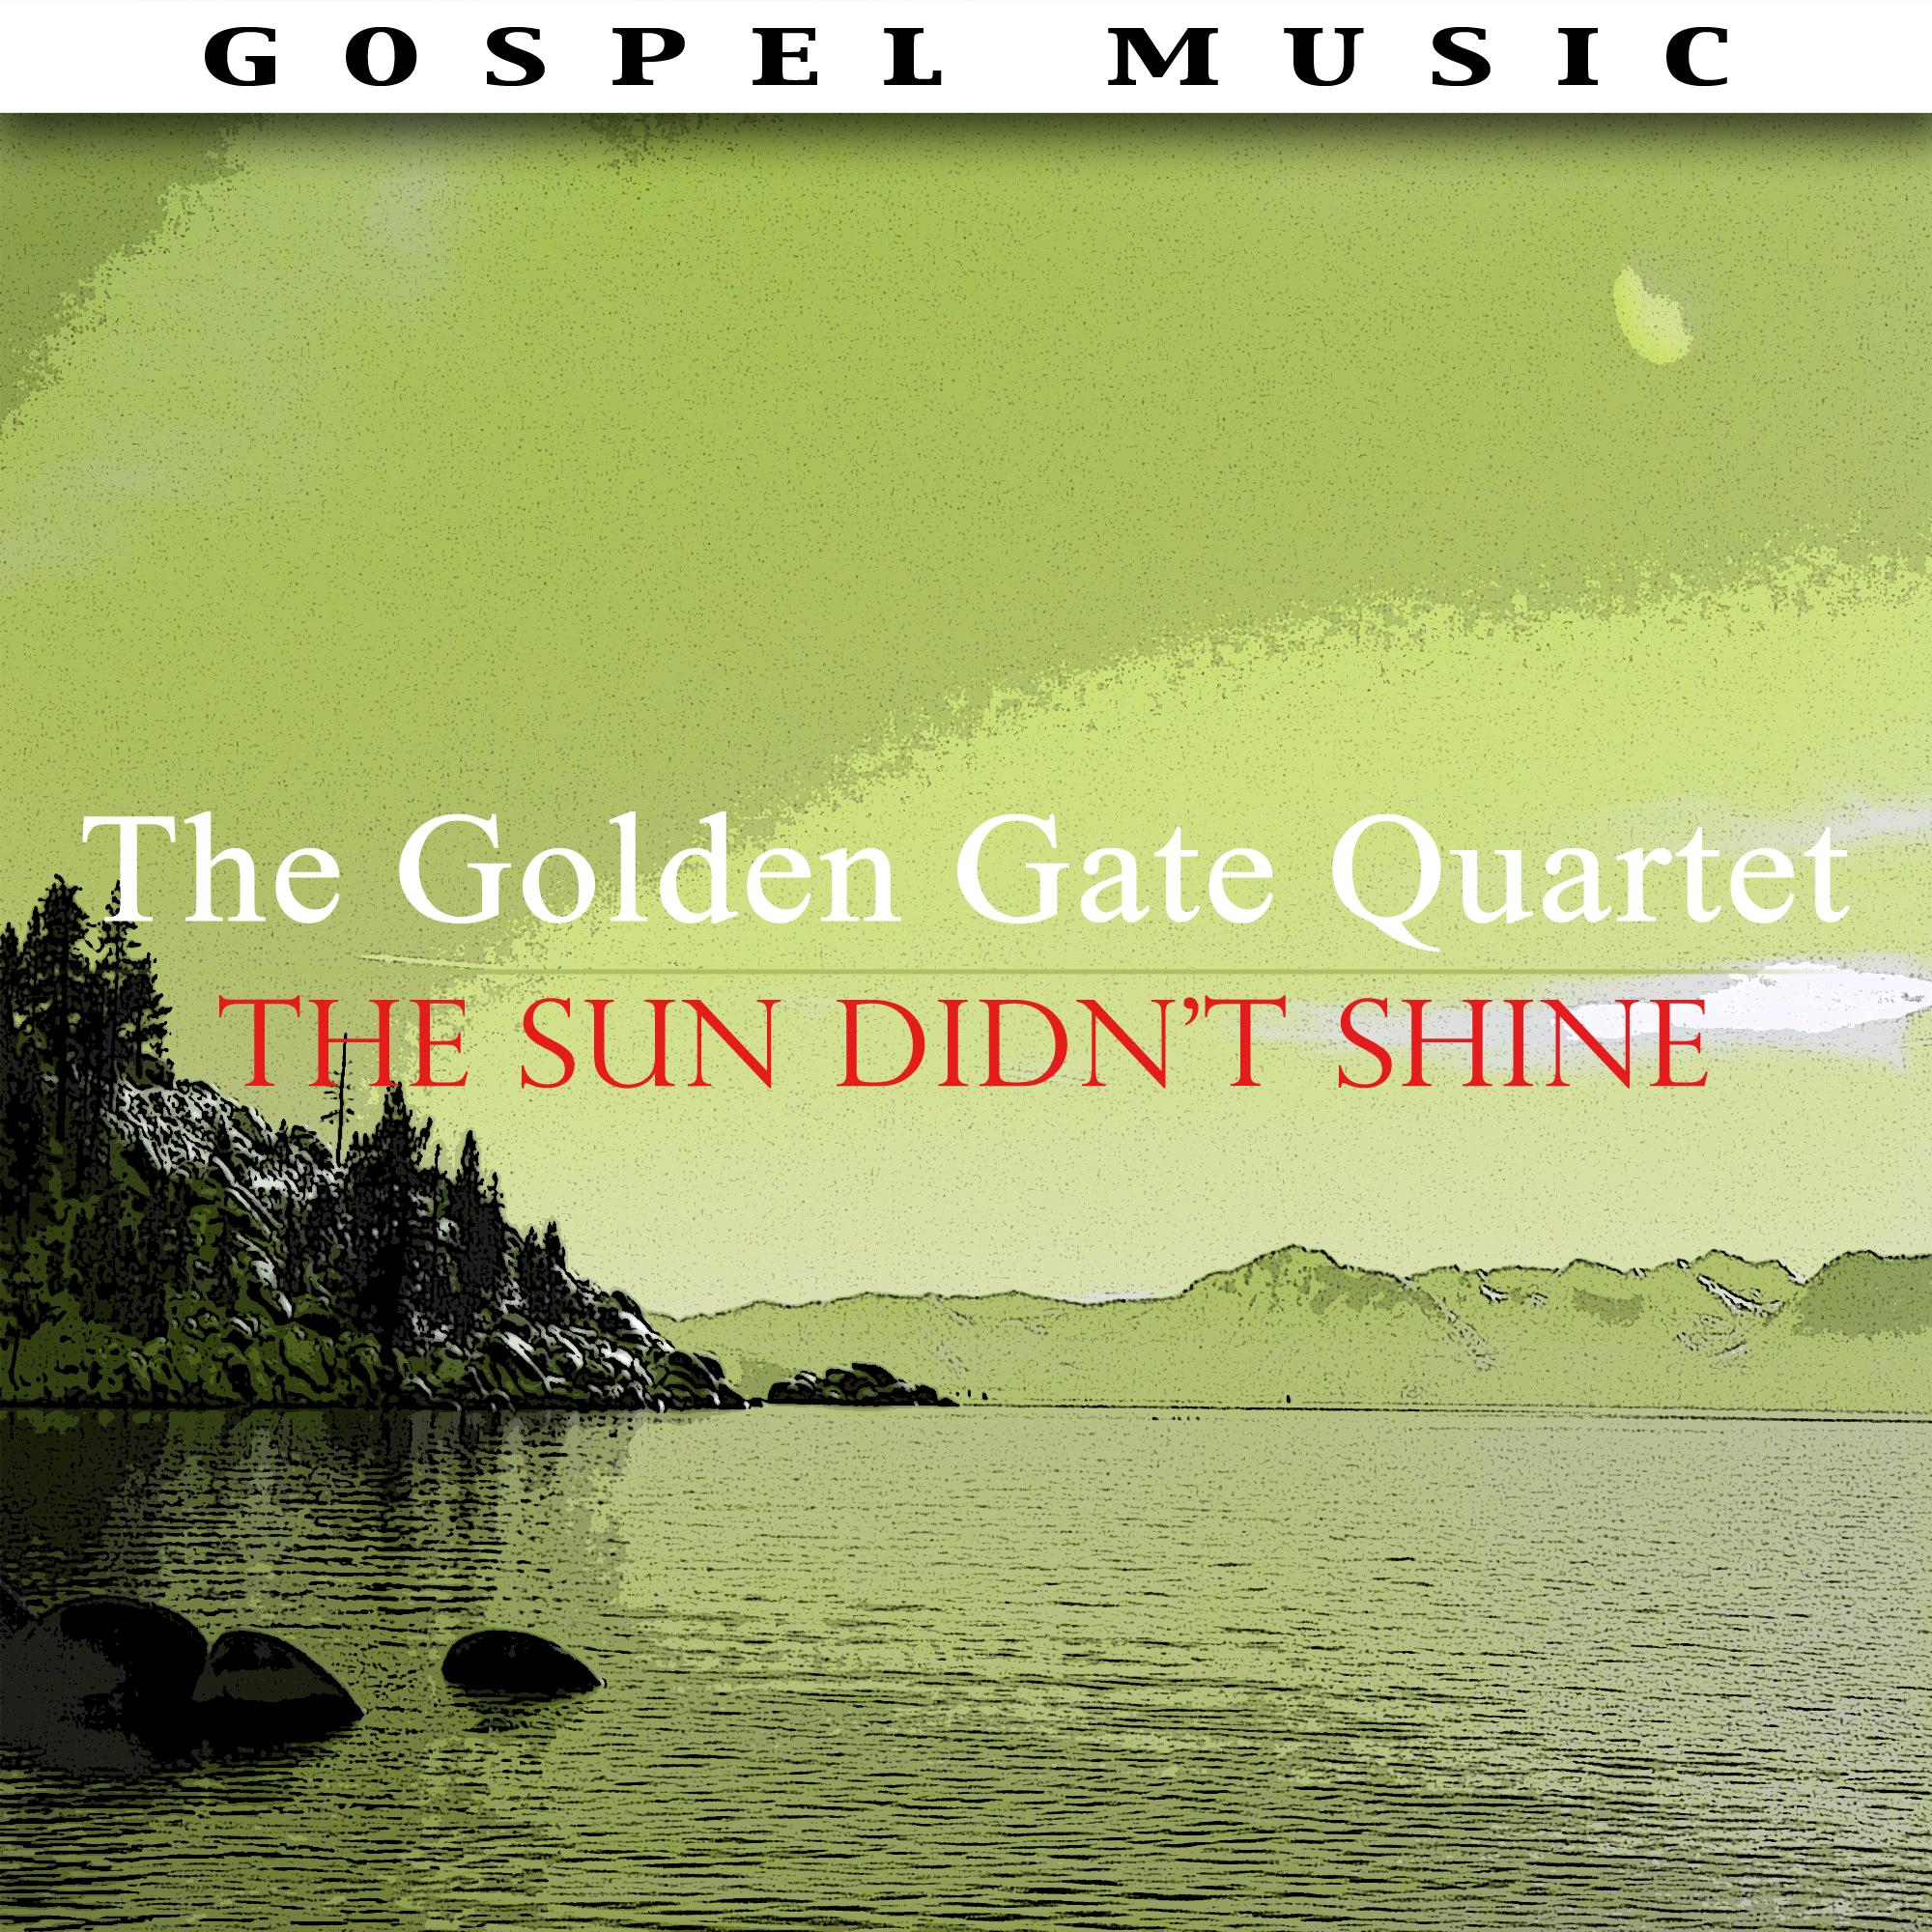 The Golden Gate Quartet – The Sun Didn't Shine